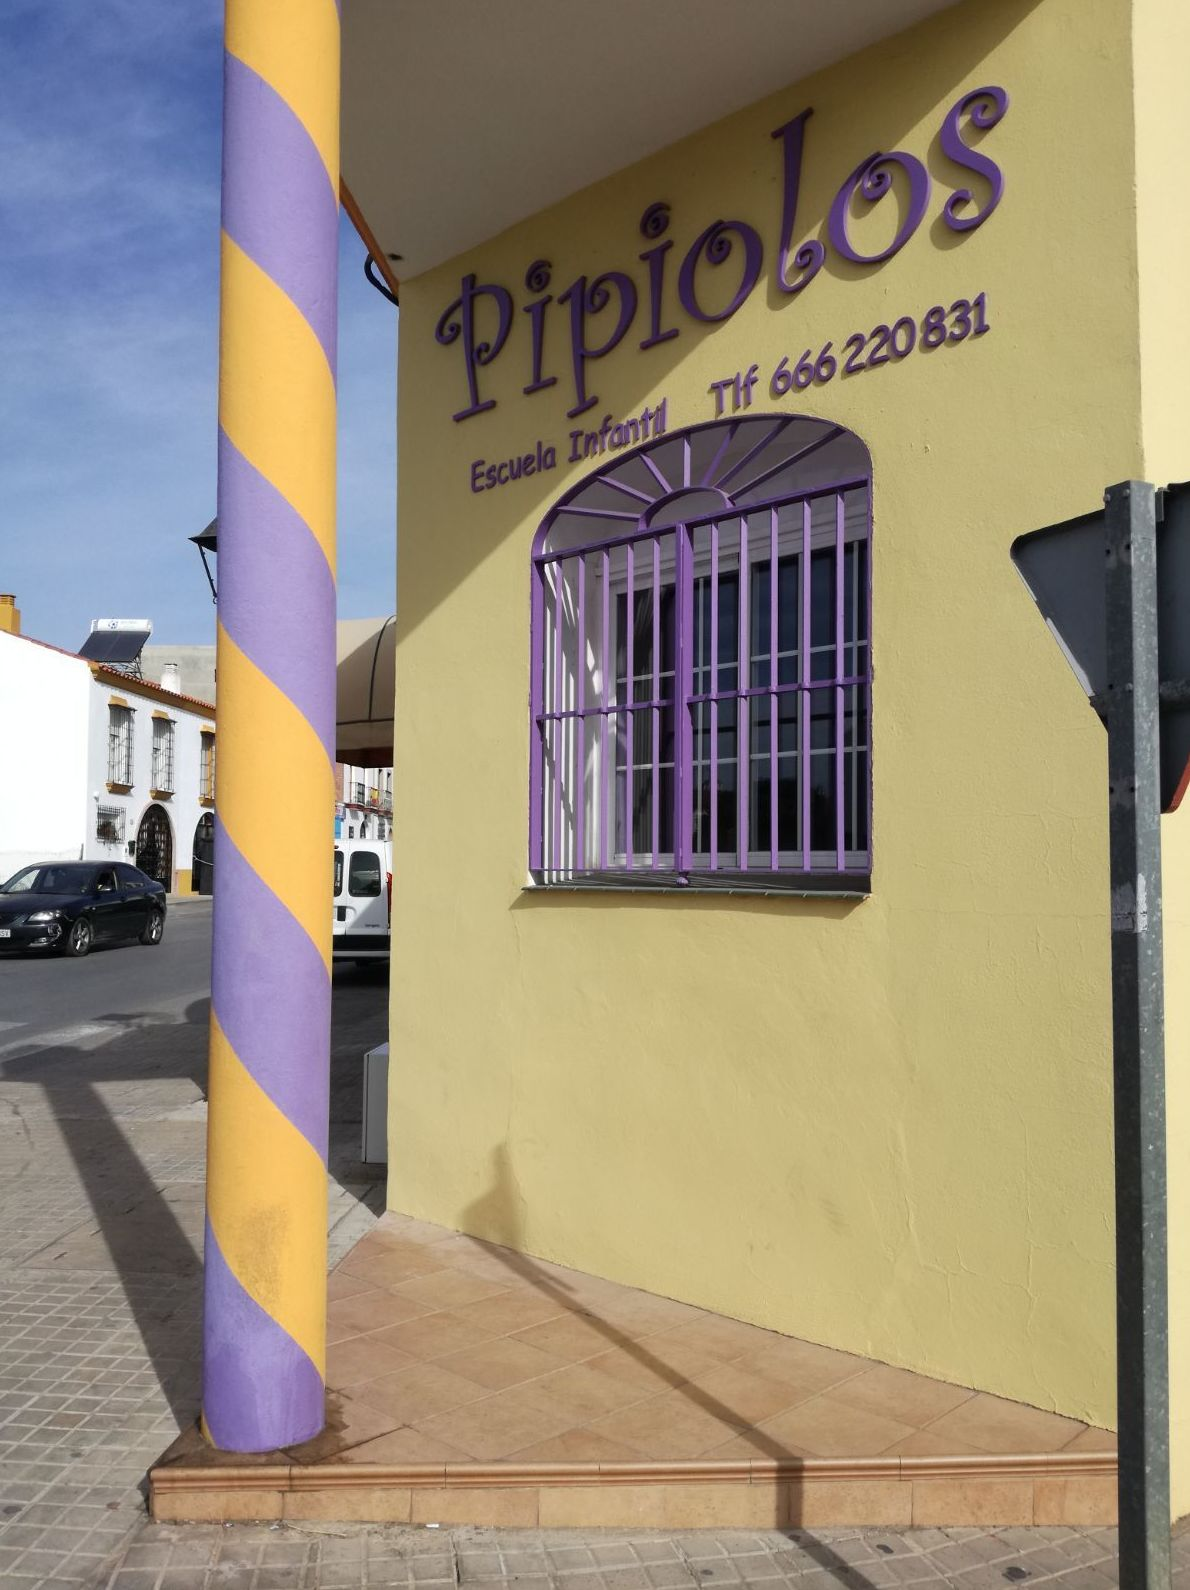 Foto 10 de Escuelas infantiles en Umbrete | Pipiolos Escuela Infantil